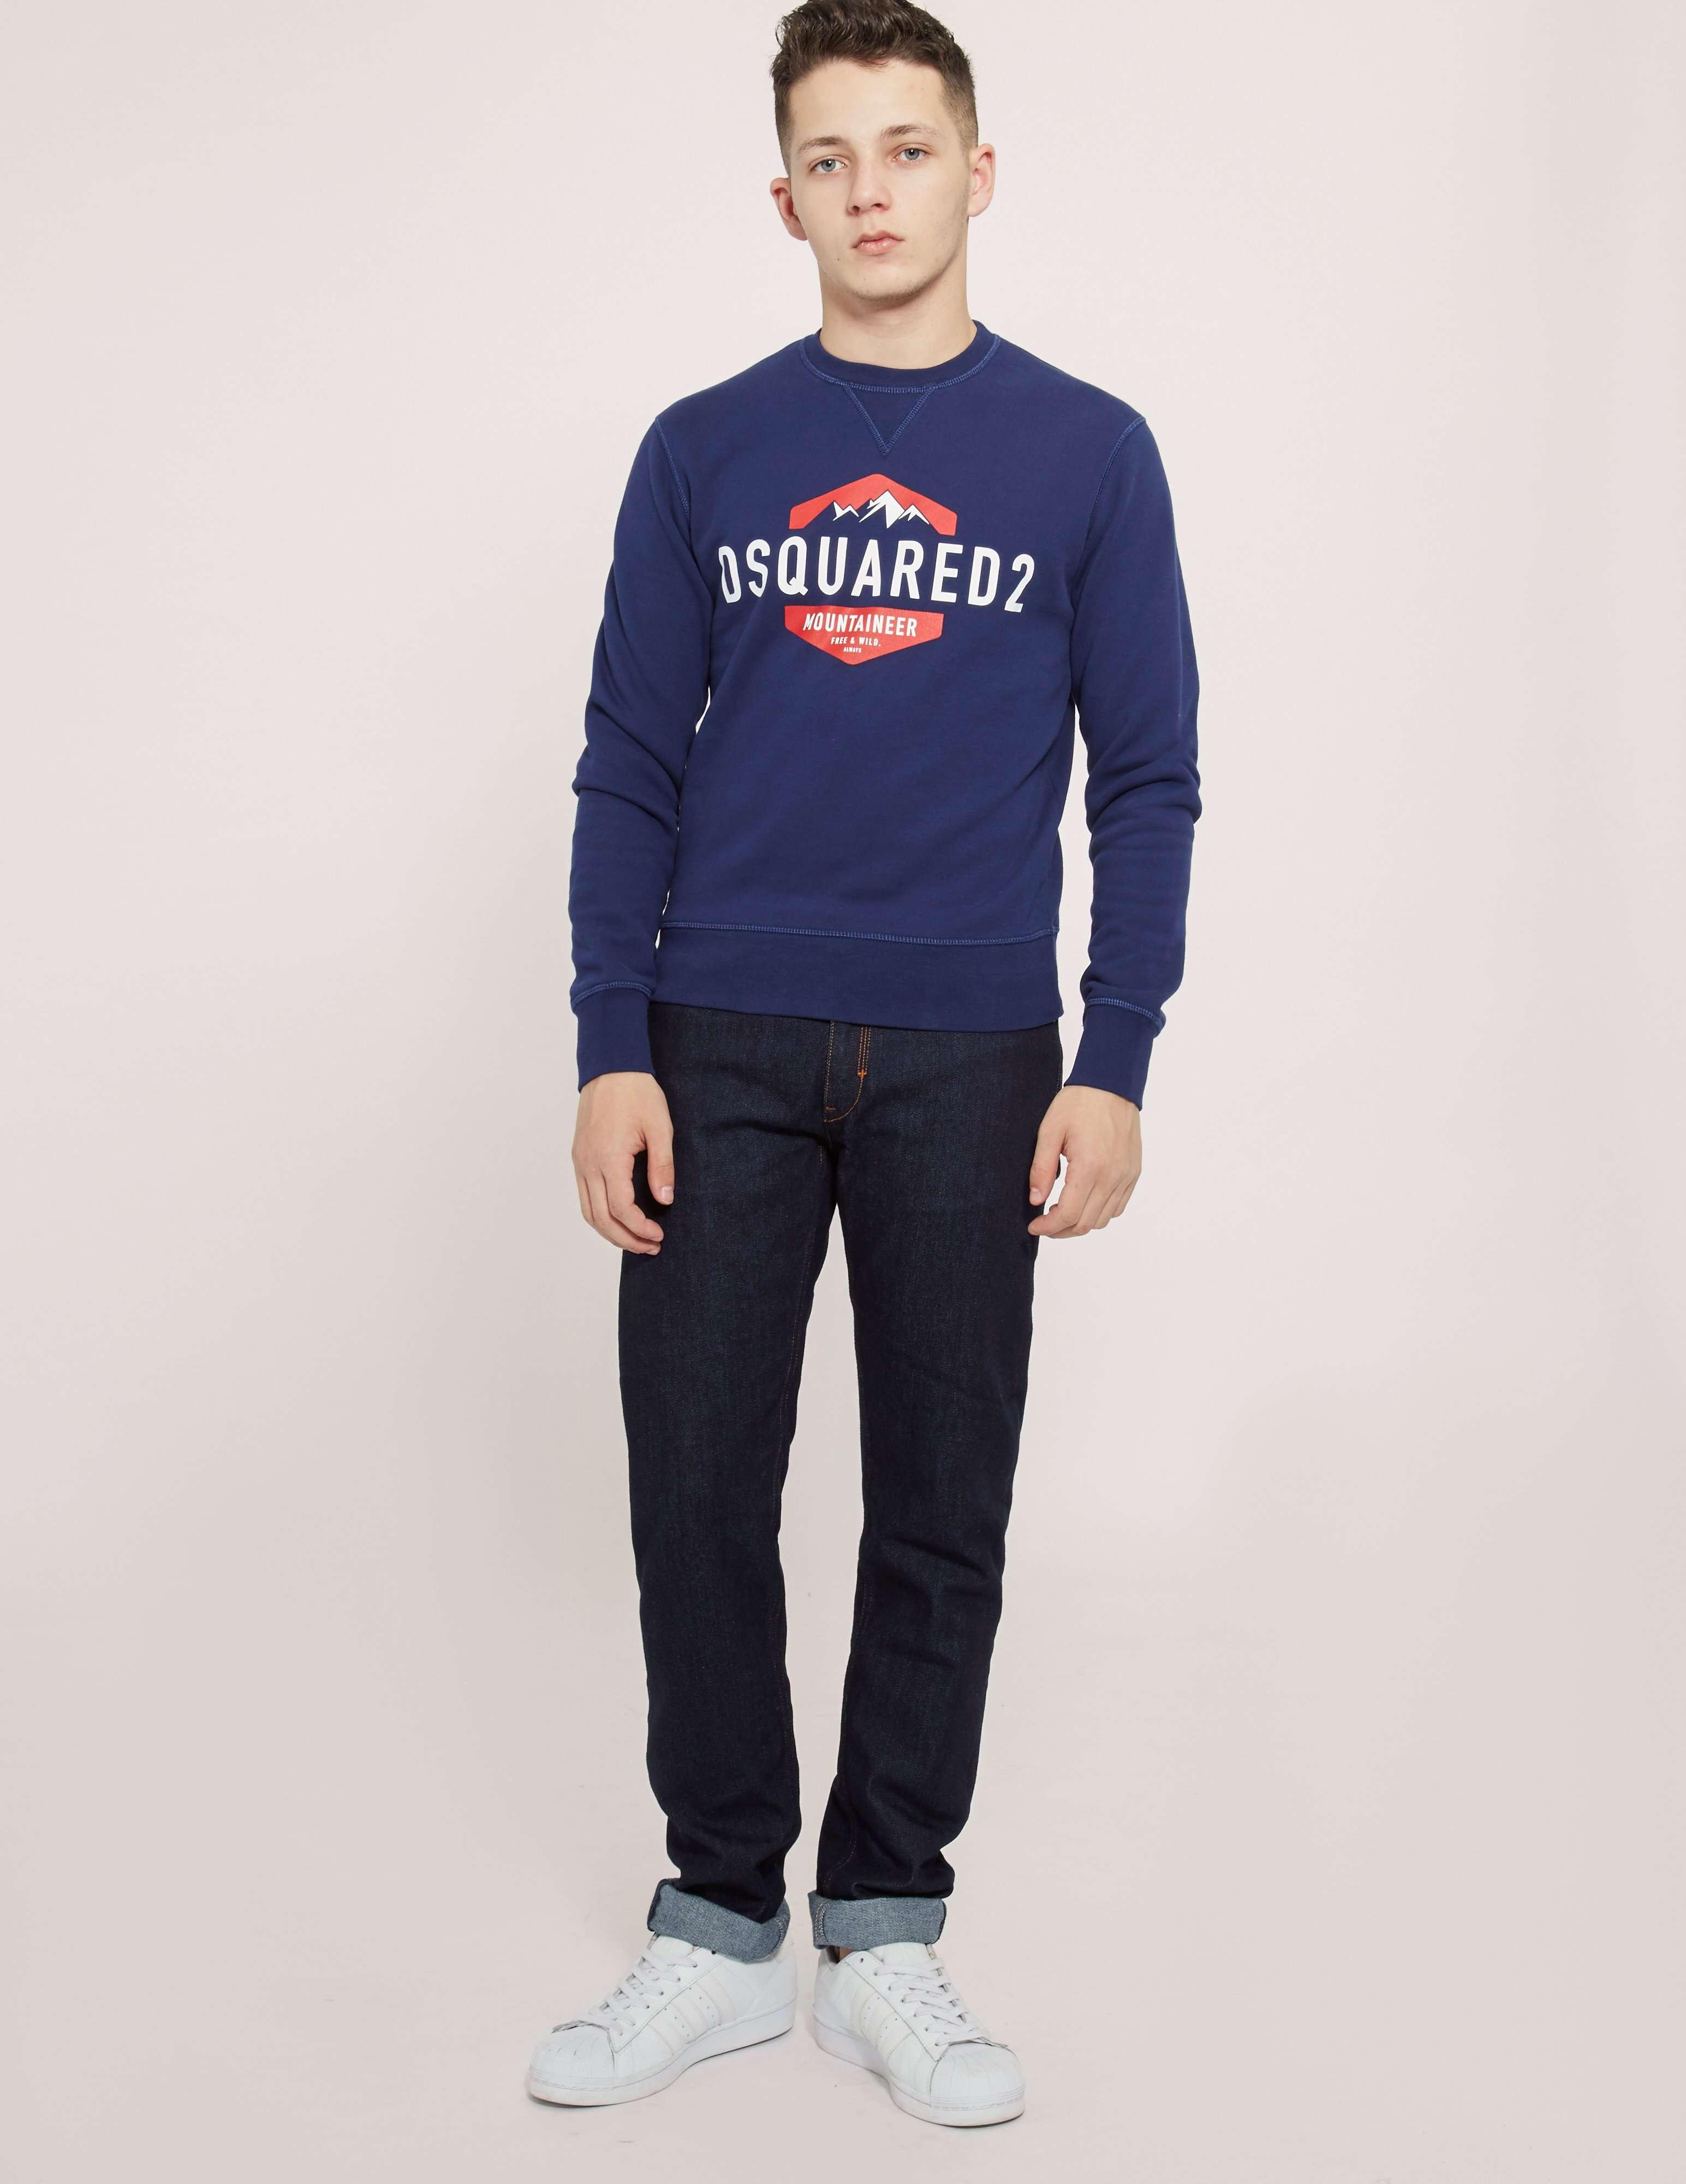 DSQUARED2 Mounaineer Sweatshirt